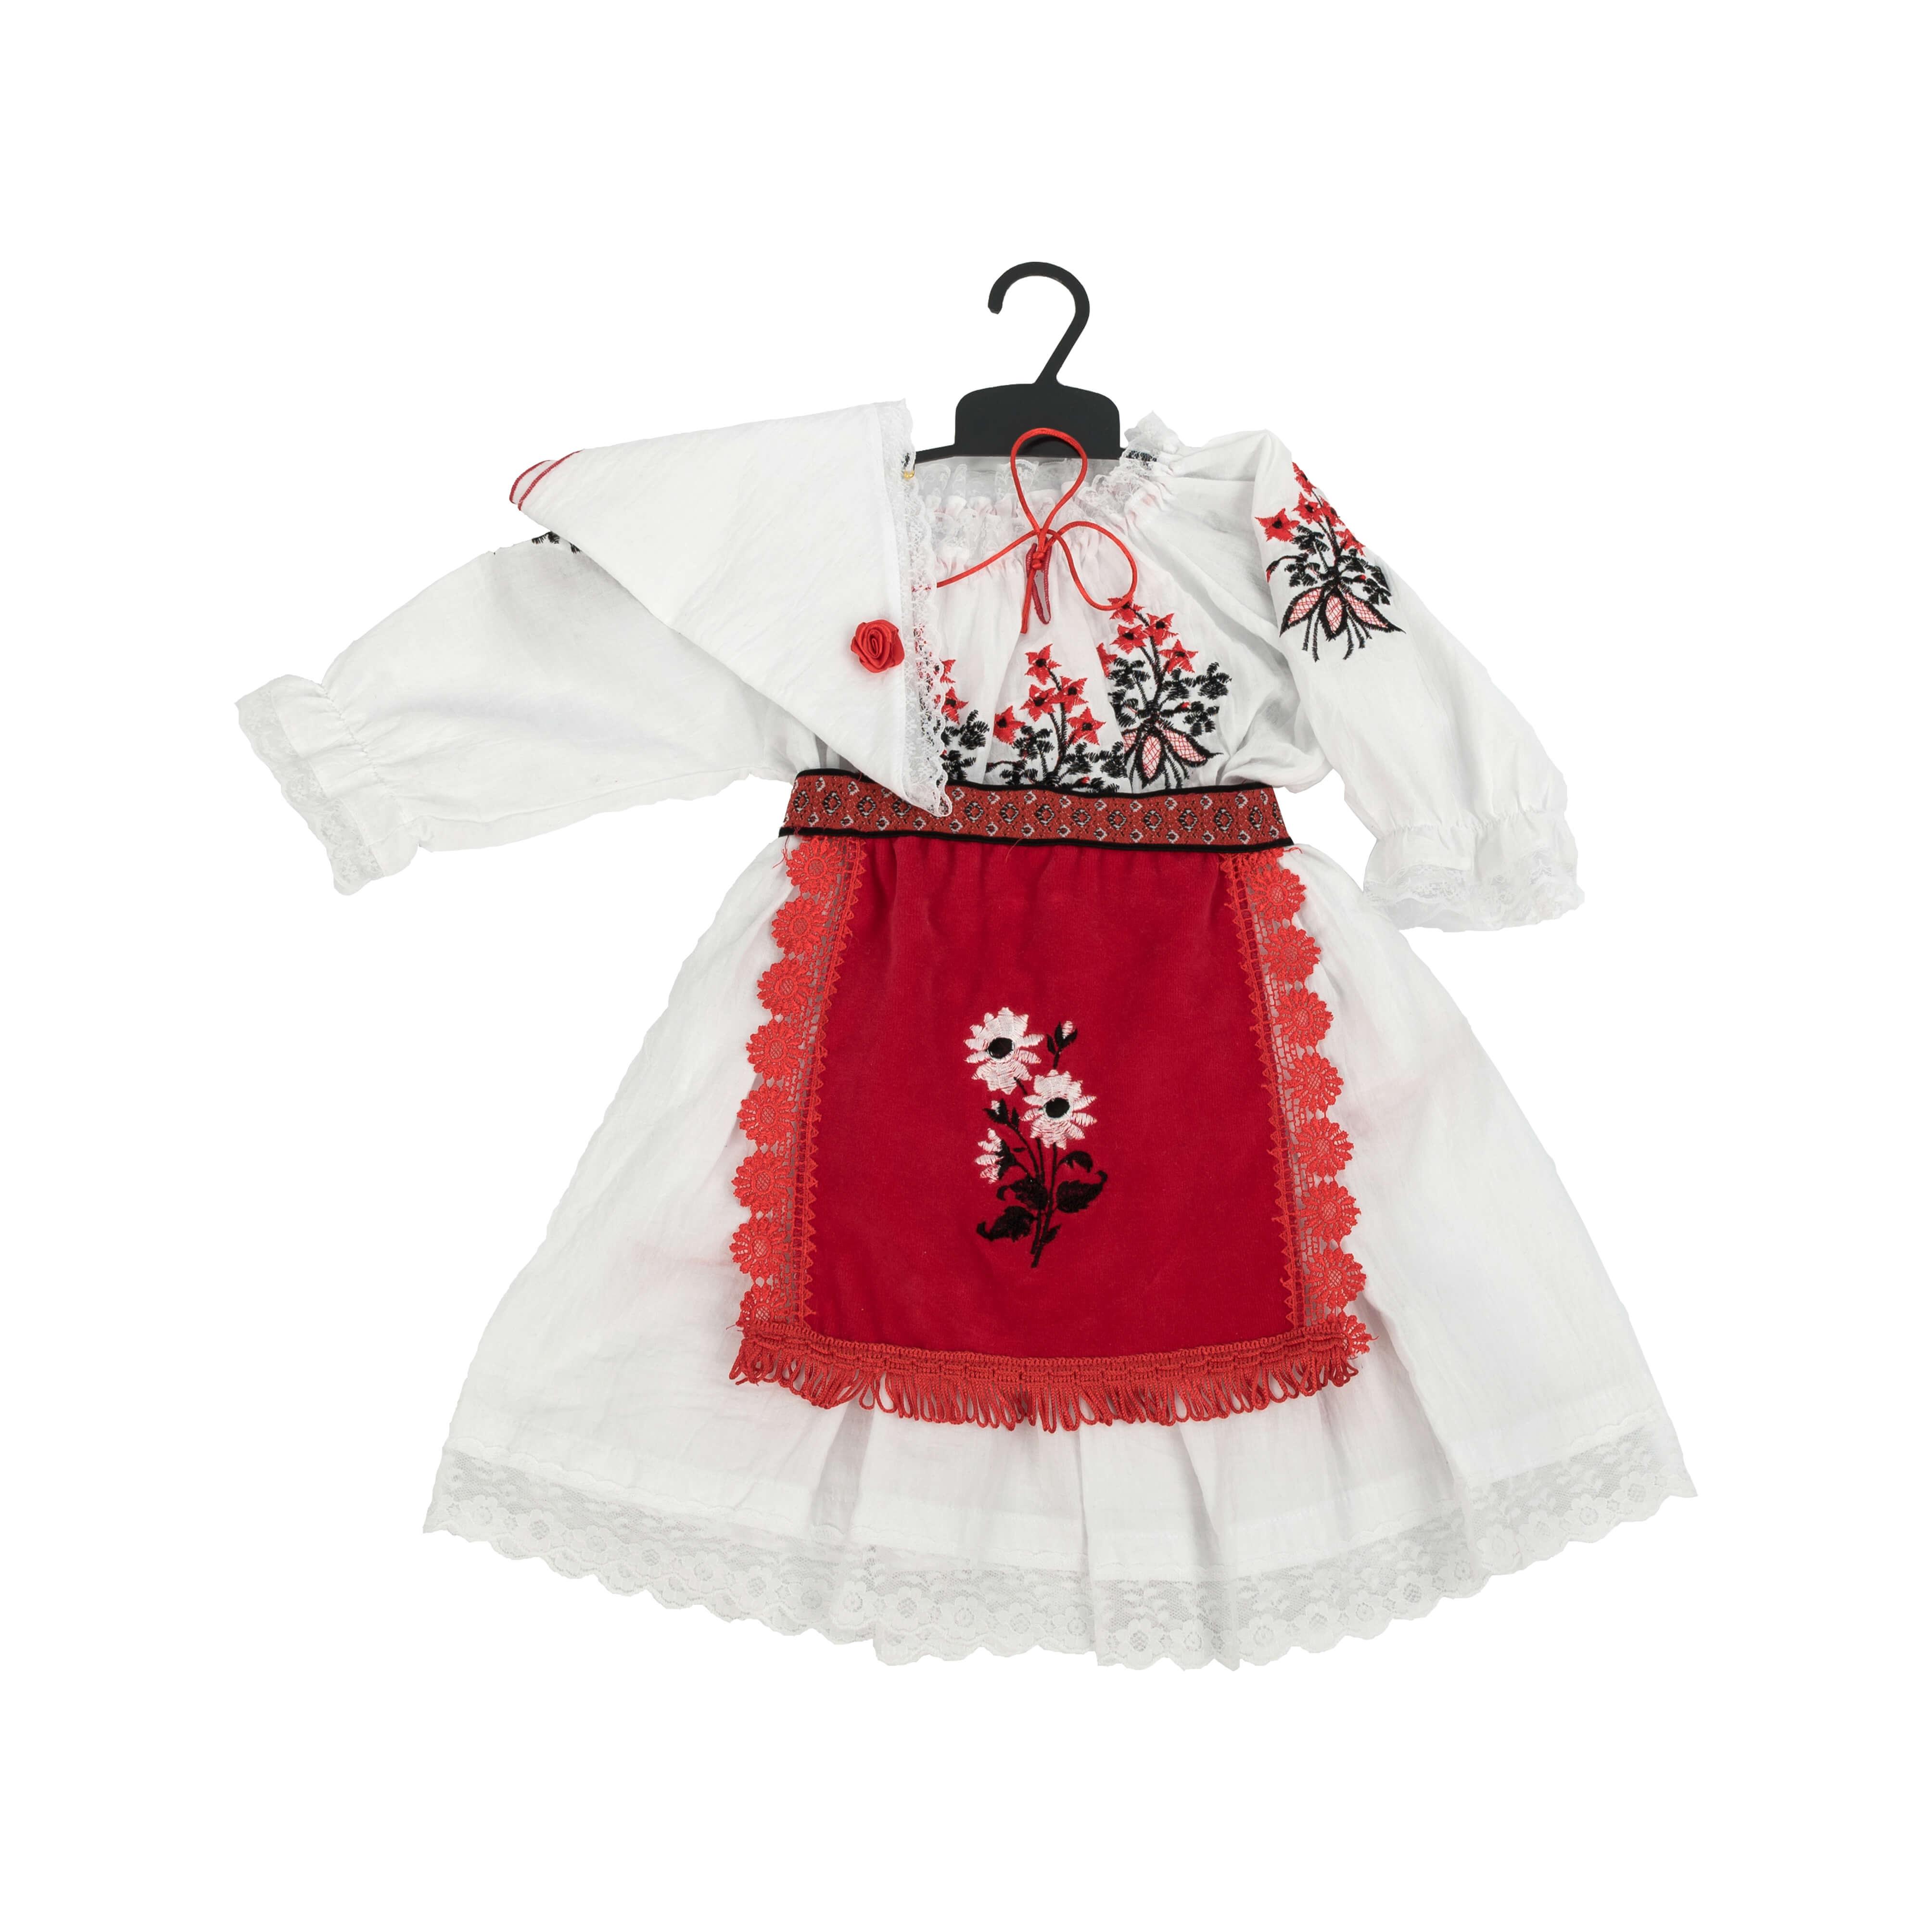 Costum national fete - zona Oltenia 2 [0]